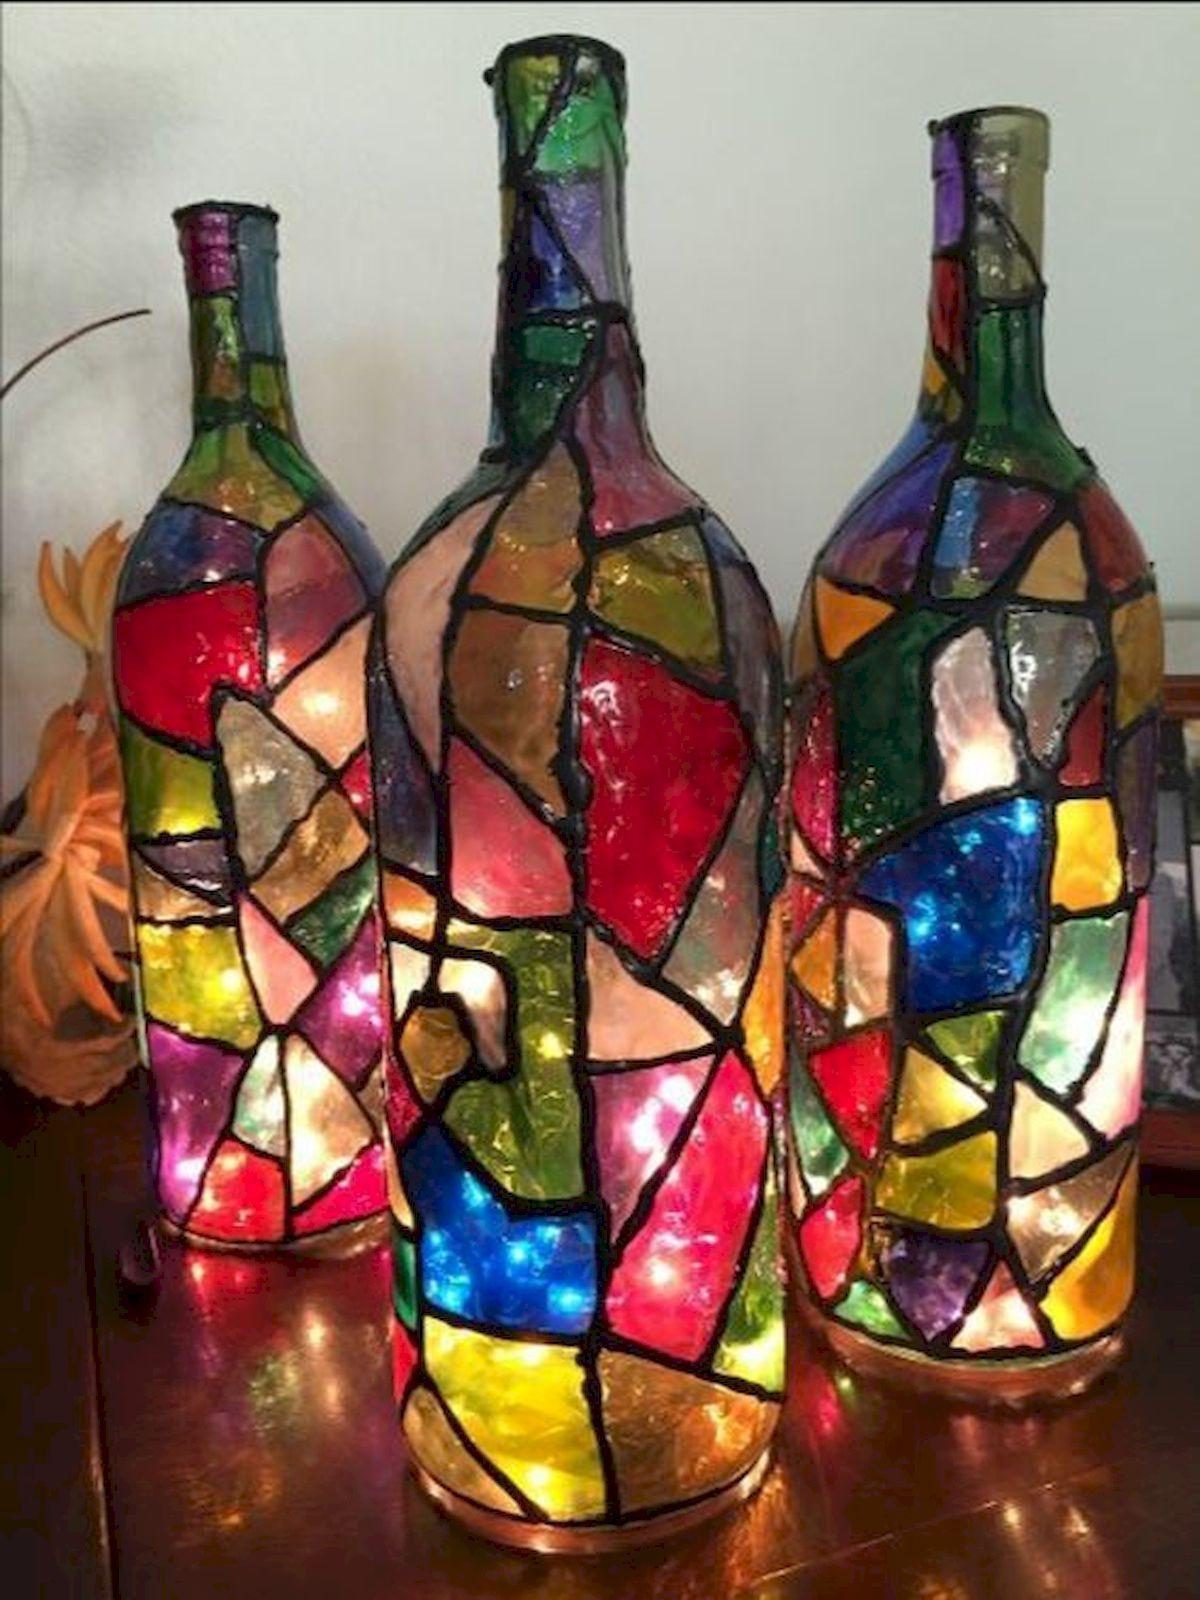 40 Fantastic Diy Wine Bottle Crafts Ideas With Lights 16 In 2020 Diy Bottle Crafts Wine Bottle Diy Crafts Bottle Crafts